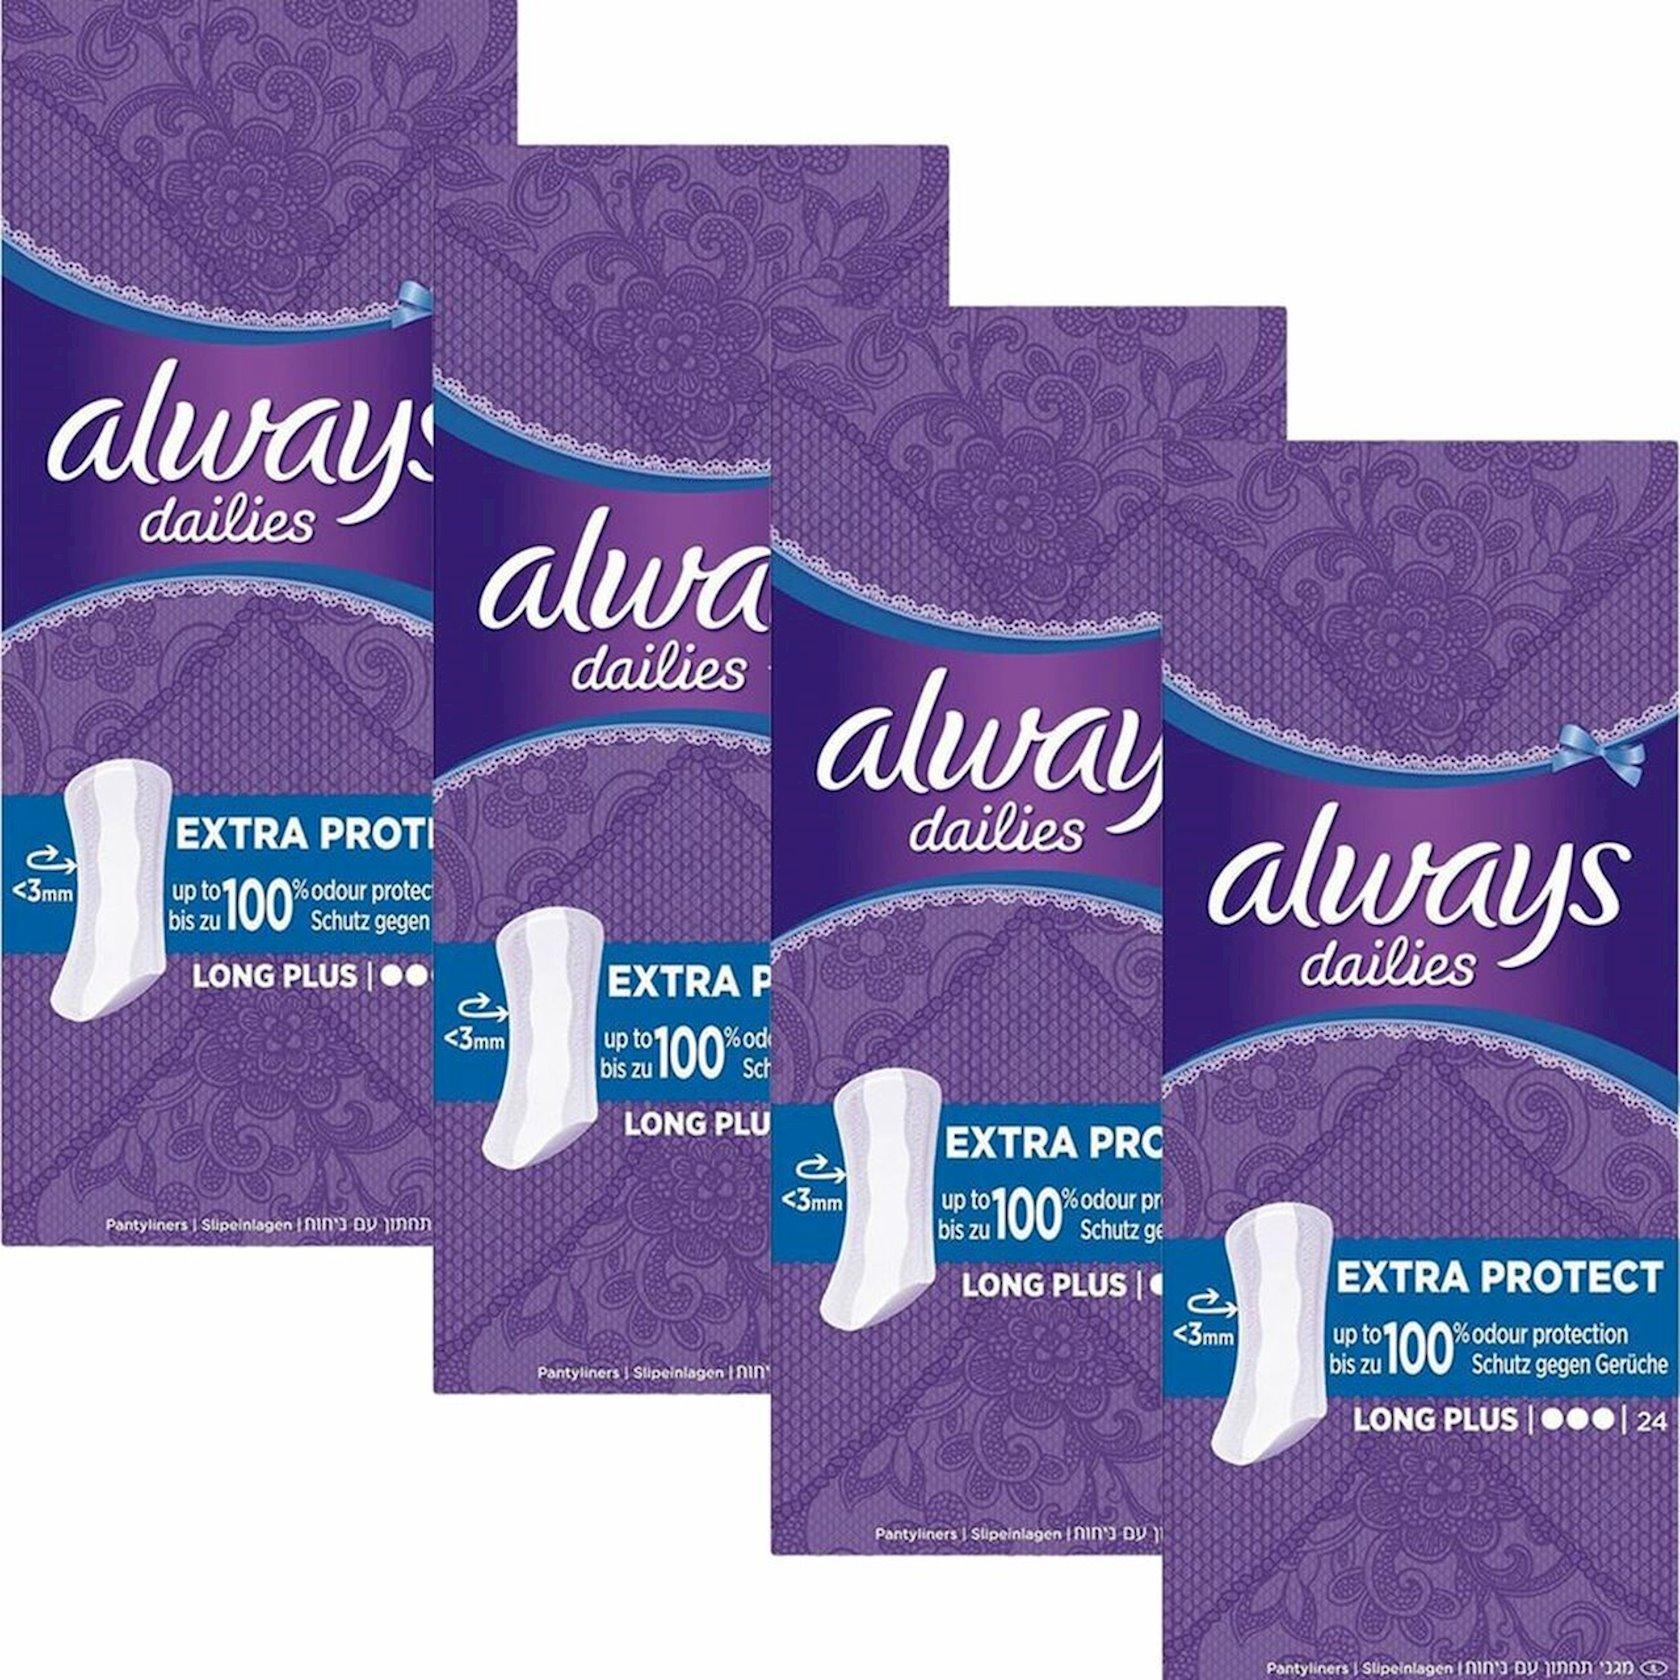 Bezlər Dailies Always Extra Protect Long Plus Panty Liners 24 ədəd